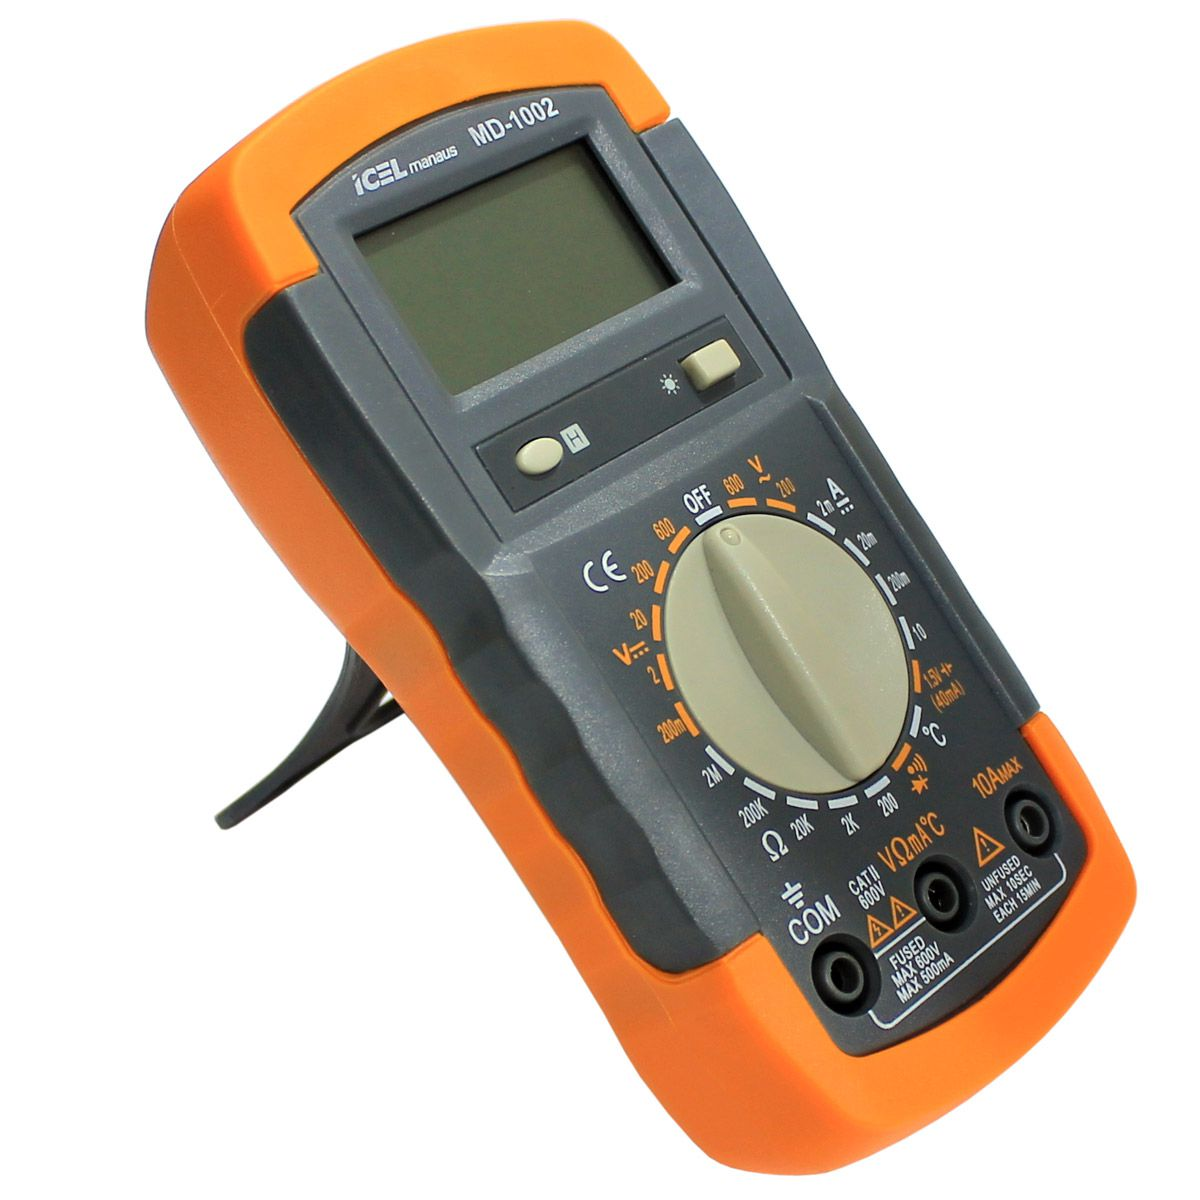 Multimetro Digital MD-1002  - Sarcompy